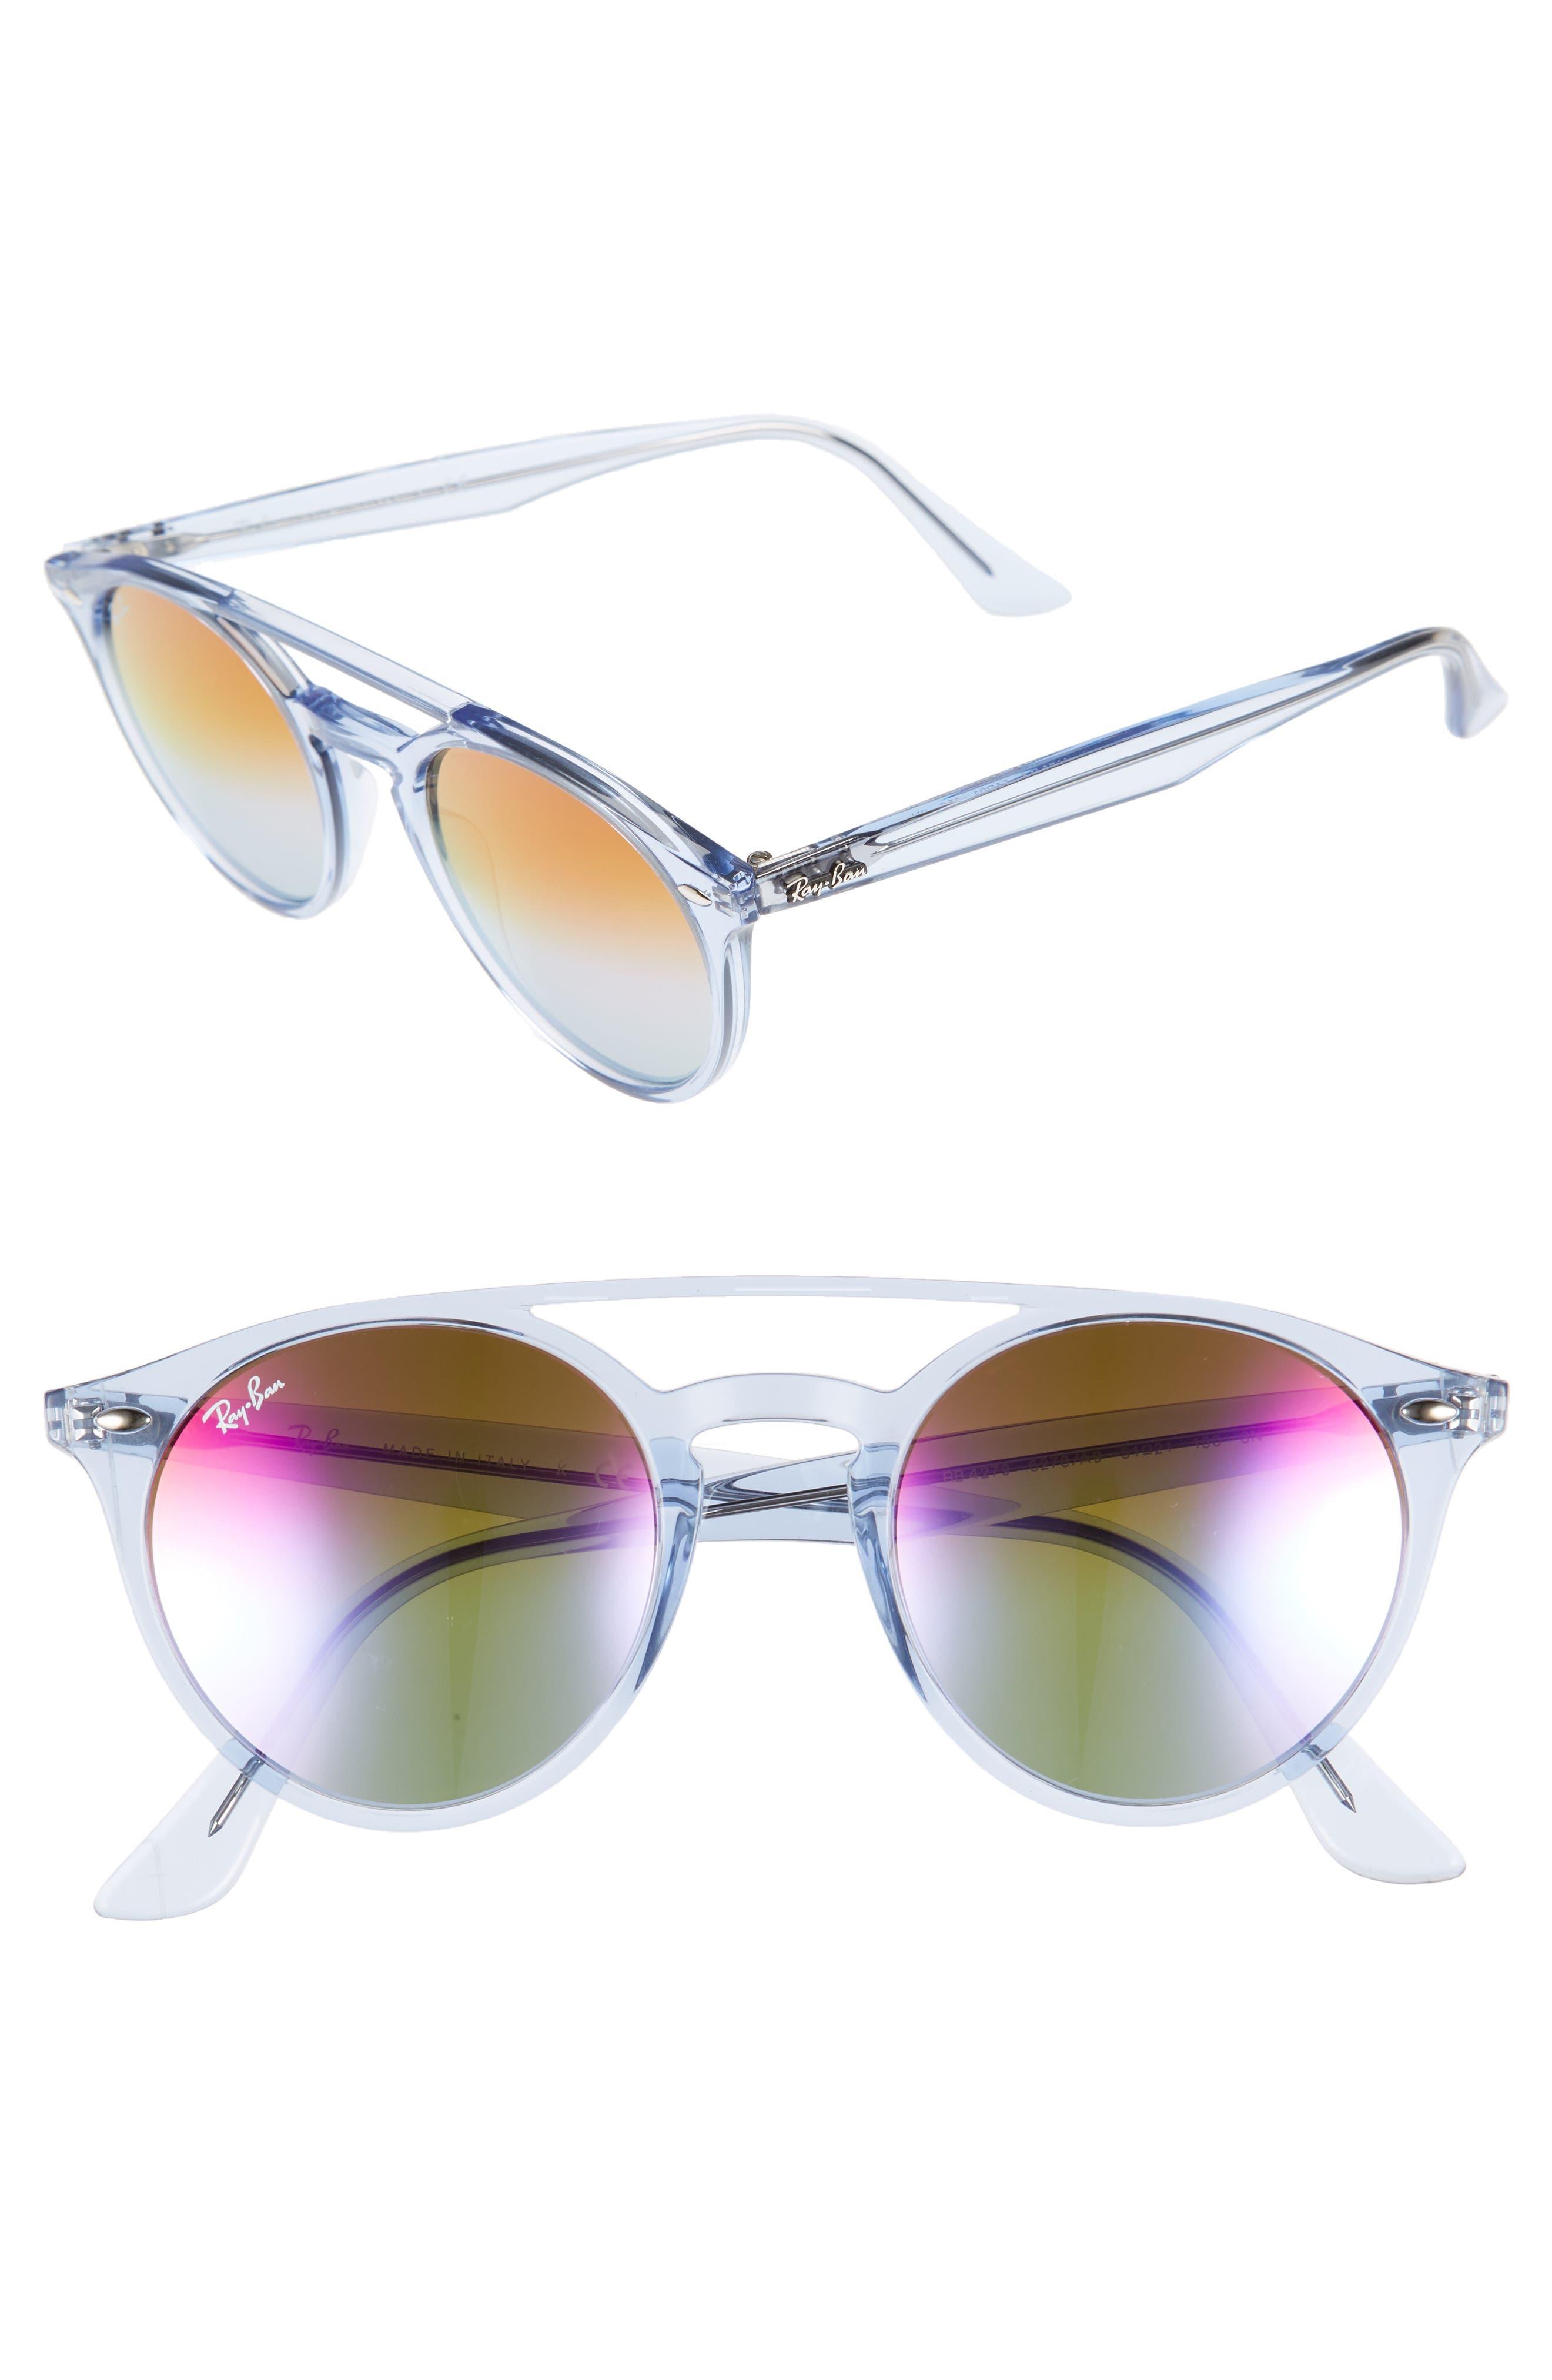 Main Image - Ray-Ban 51mm Mirrored Rainbow Sunglasses